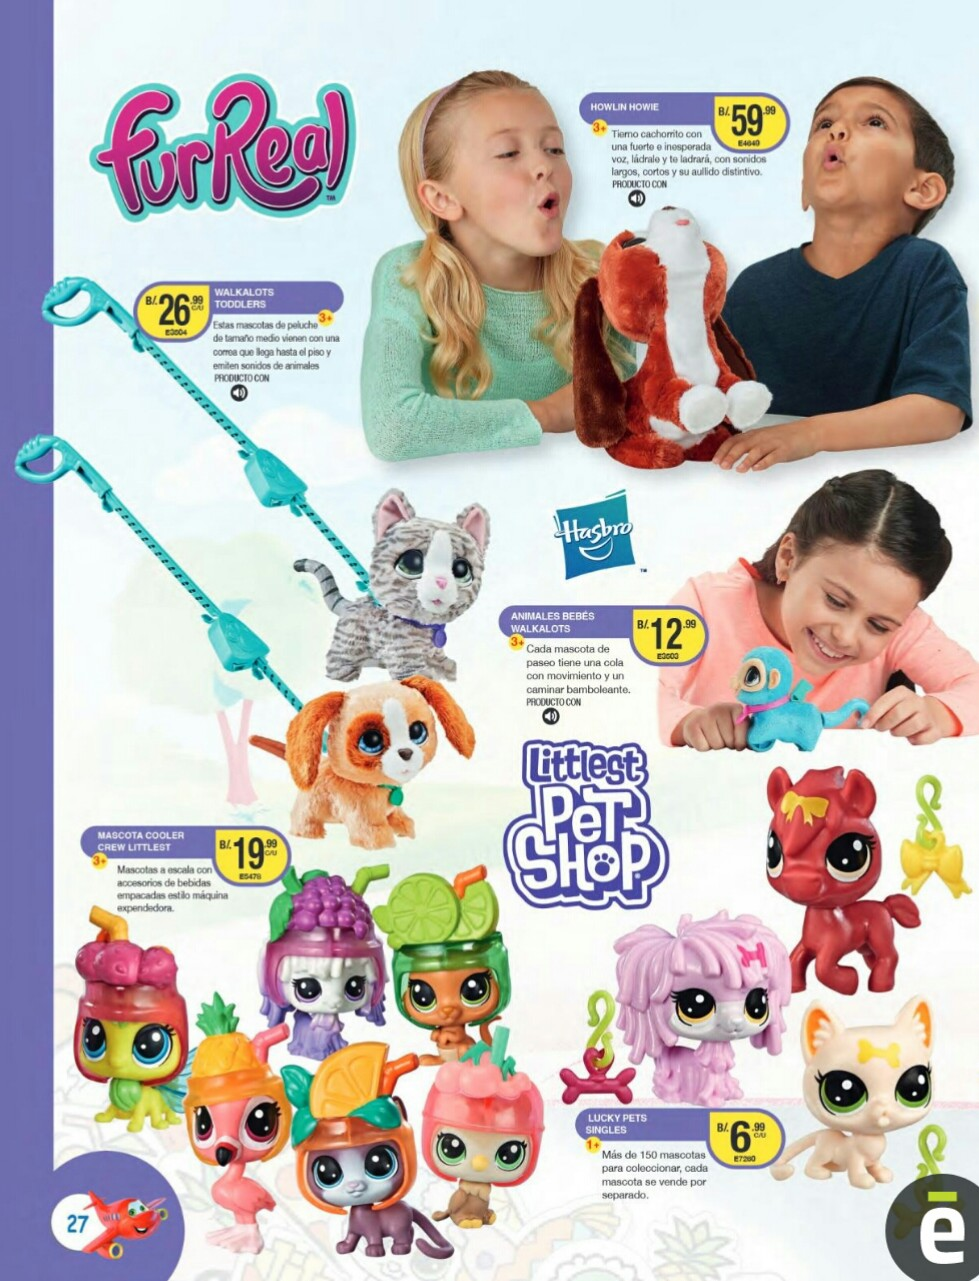 Catalogo juguetes Titan Toys 2019 p27